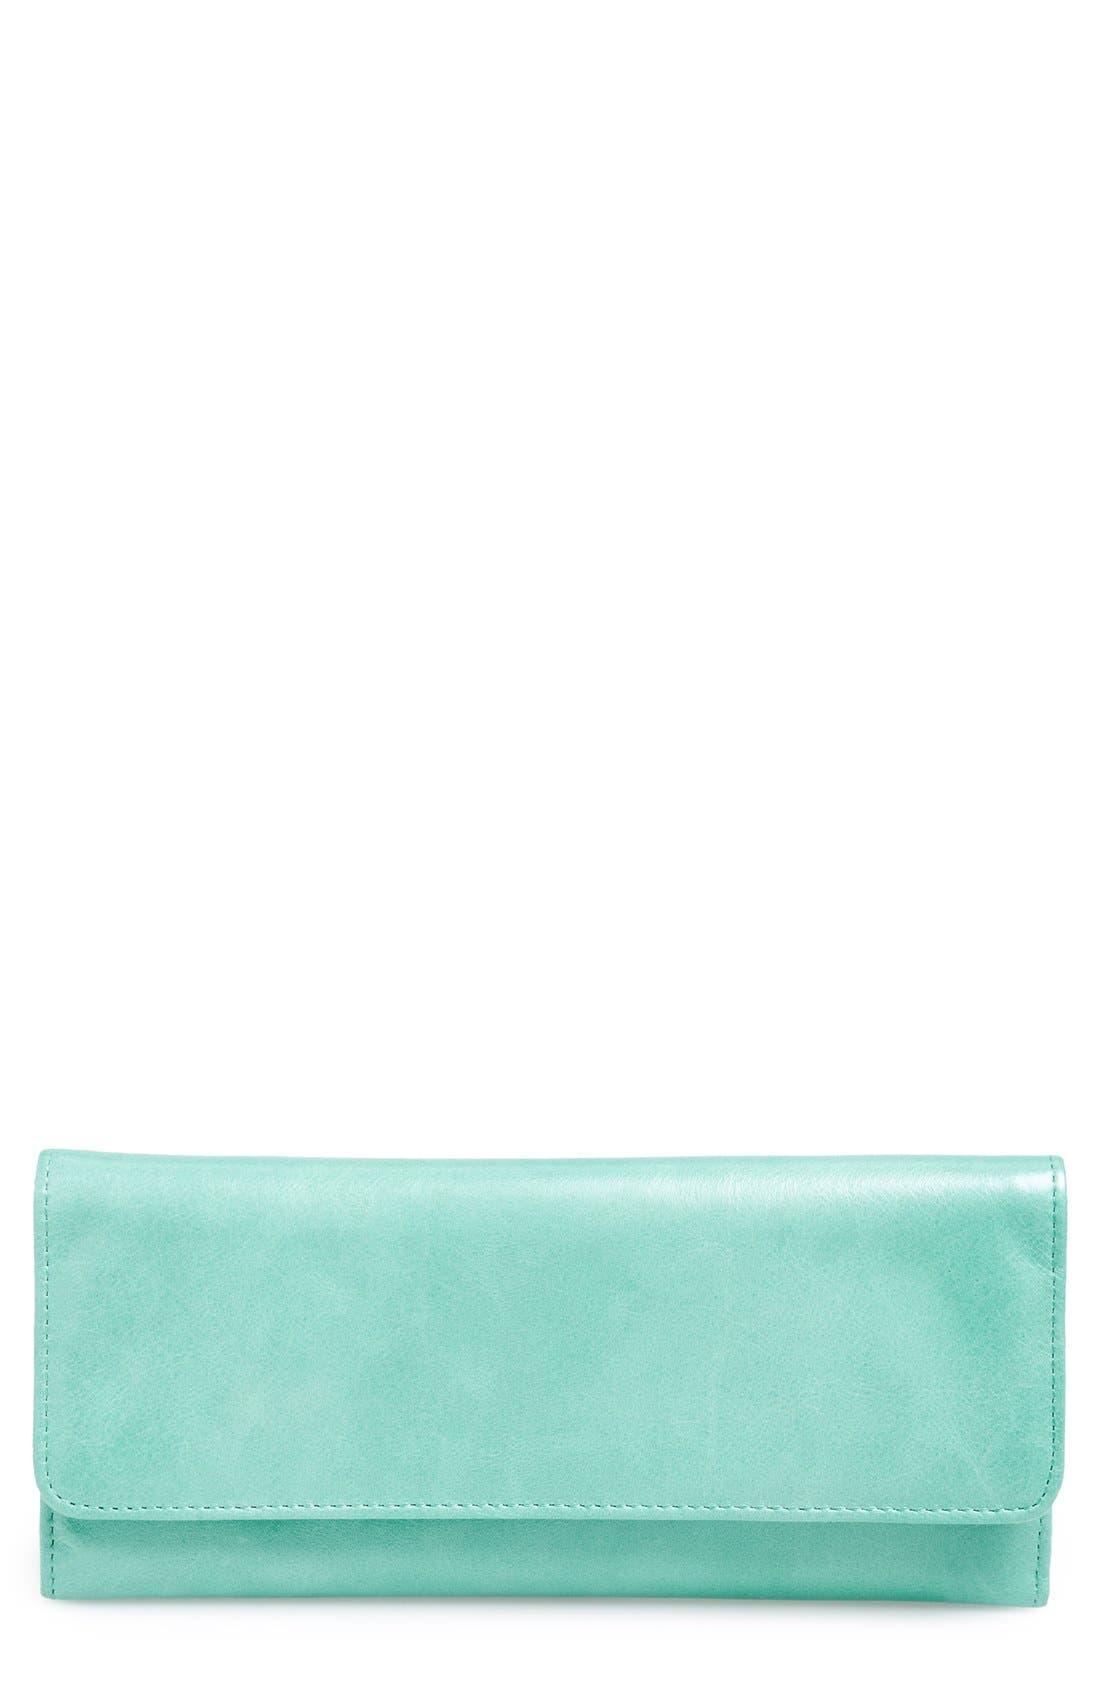 'Sadie' Leather Wallet,                             Main thumbnail 40, color,